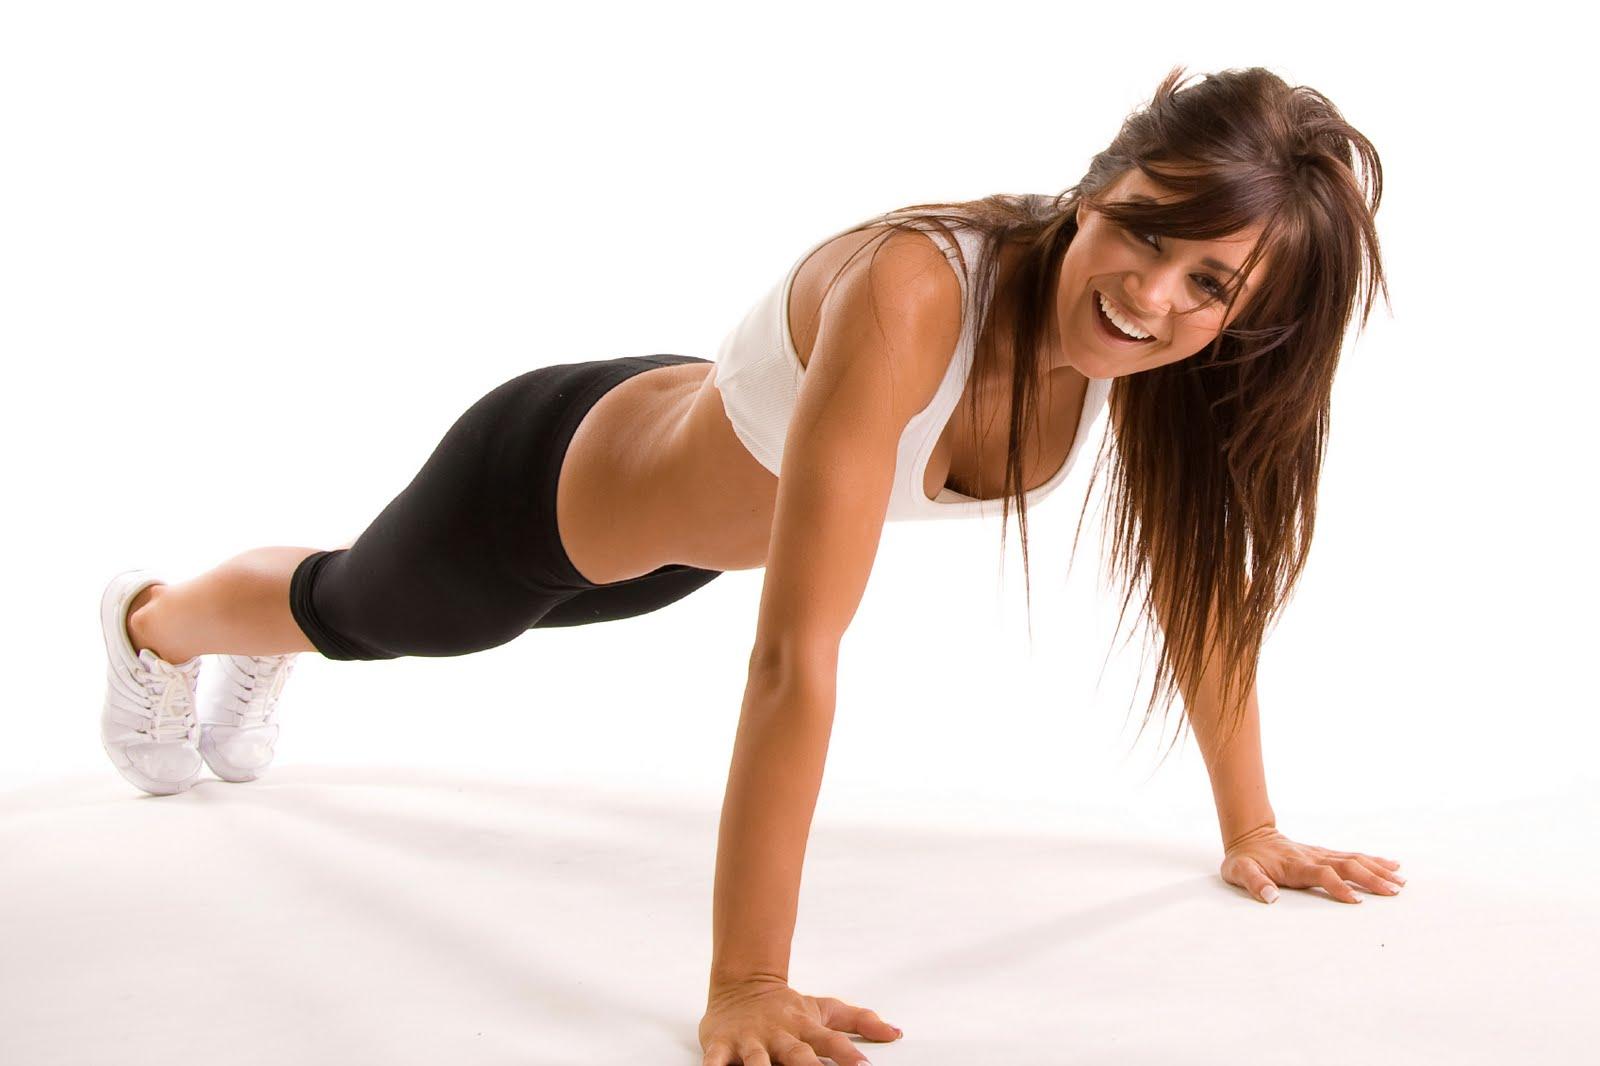 hot-fitness-girl-doing-push-ups1600-x-1066-95-kb-jpeg-x